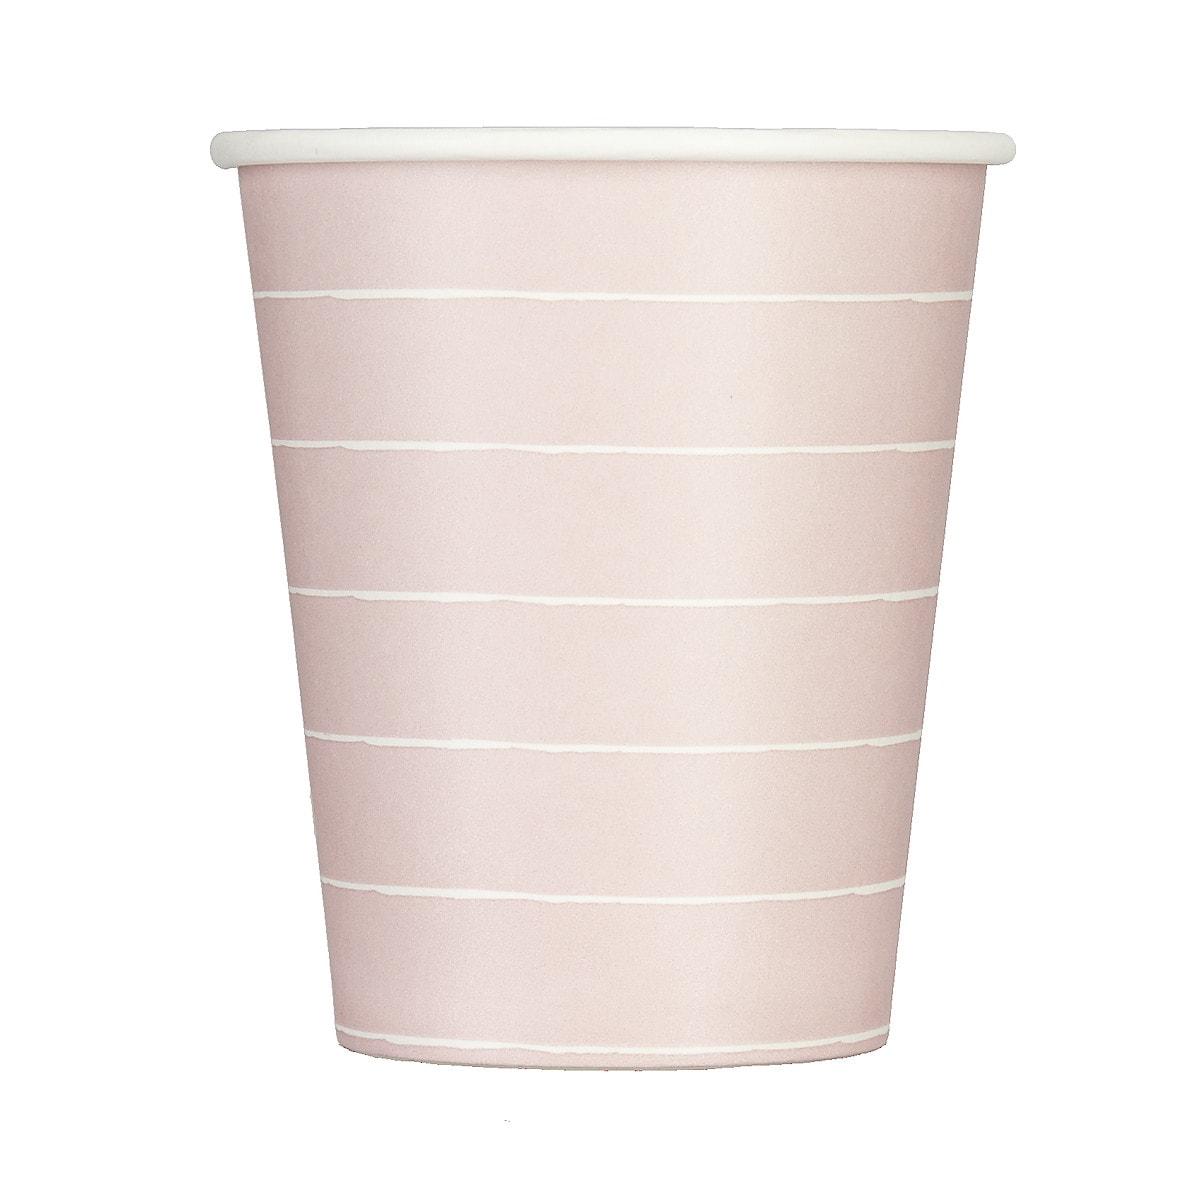 Pappbecher 230 ml rosa-weiß, 20er-Pack